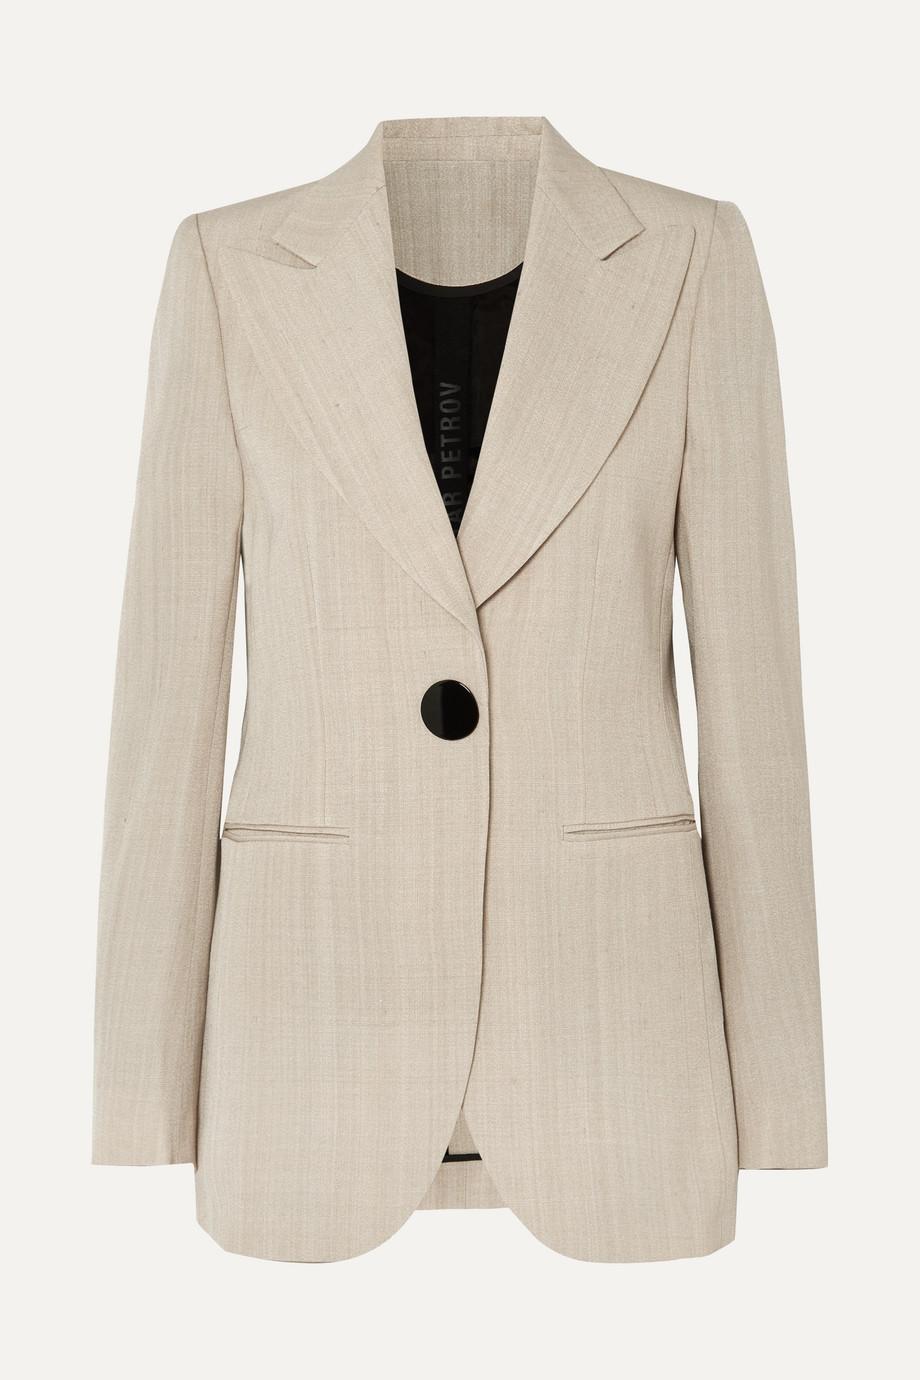 Exact Product: Julian woven blazer, Brand: Petar Petrov, Available on: net-a-porter.com, Price: $1325